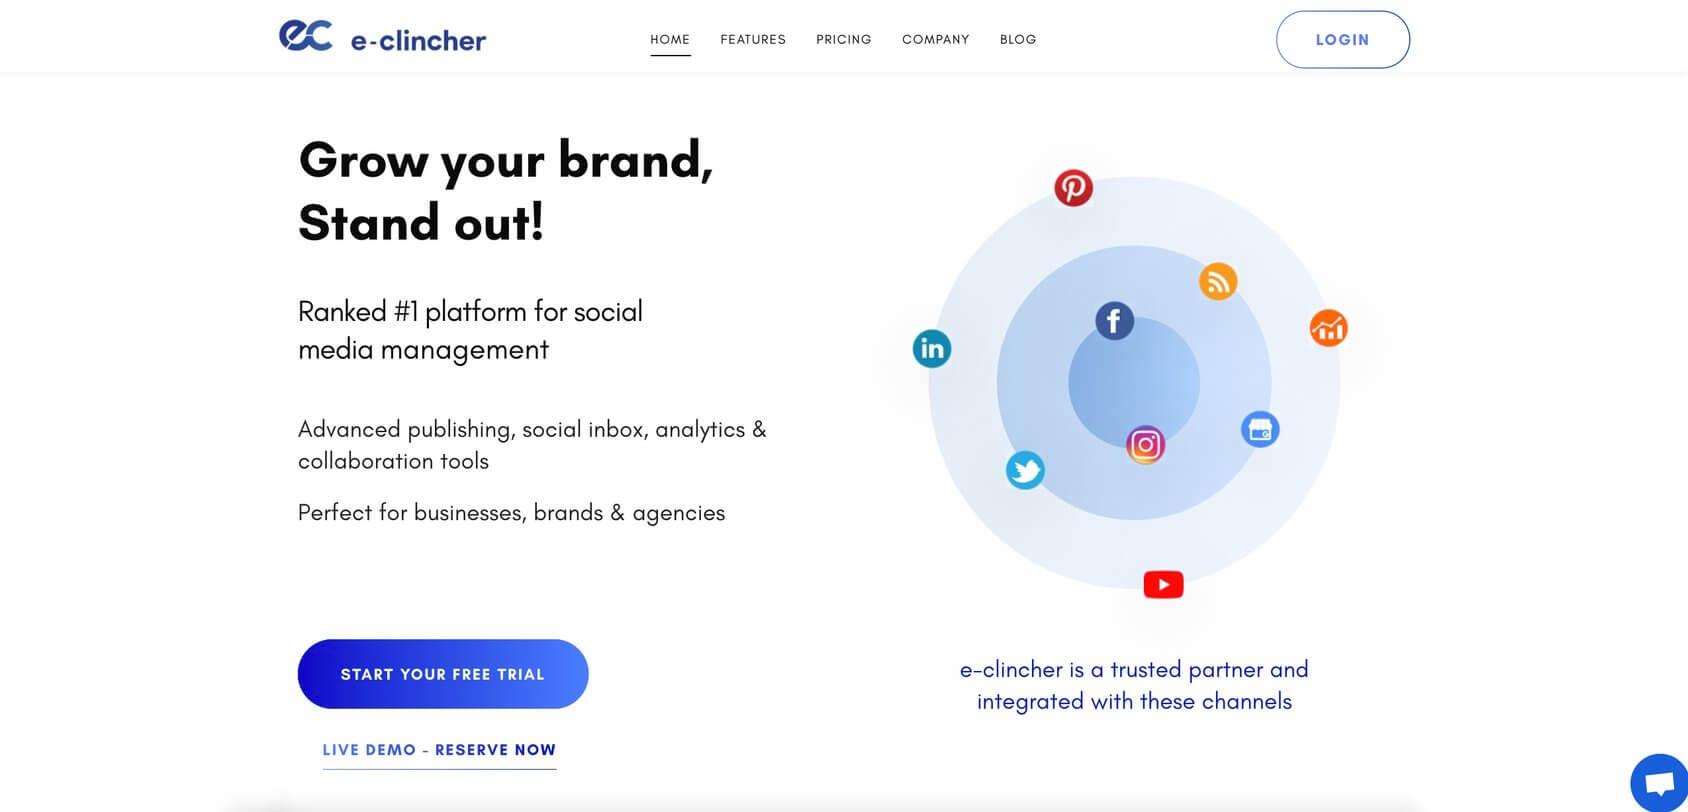 eClincher homepage